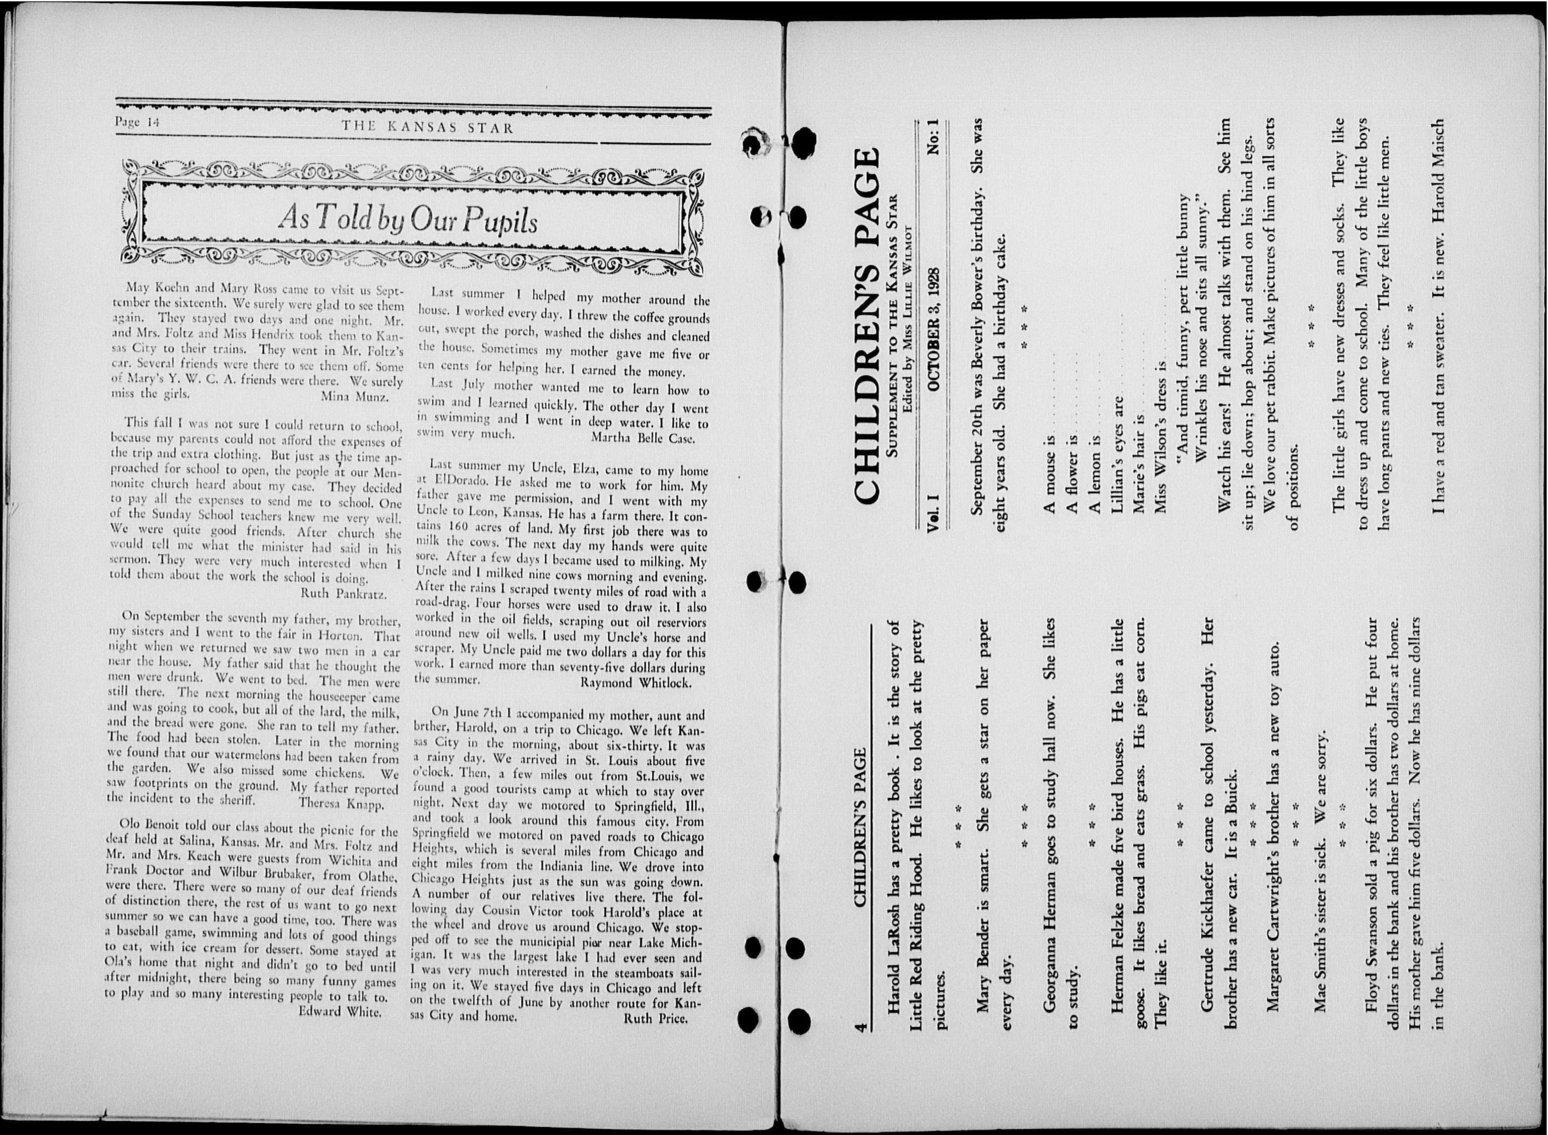 The Kansas Star, volume 52, number 1 - 14-Children's page